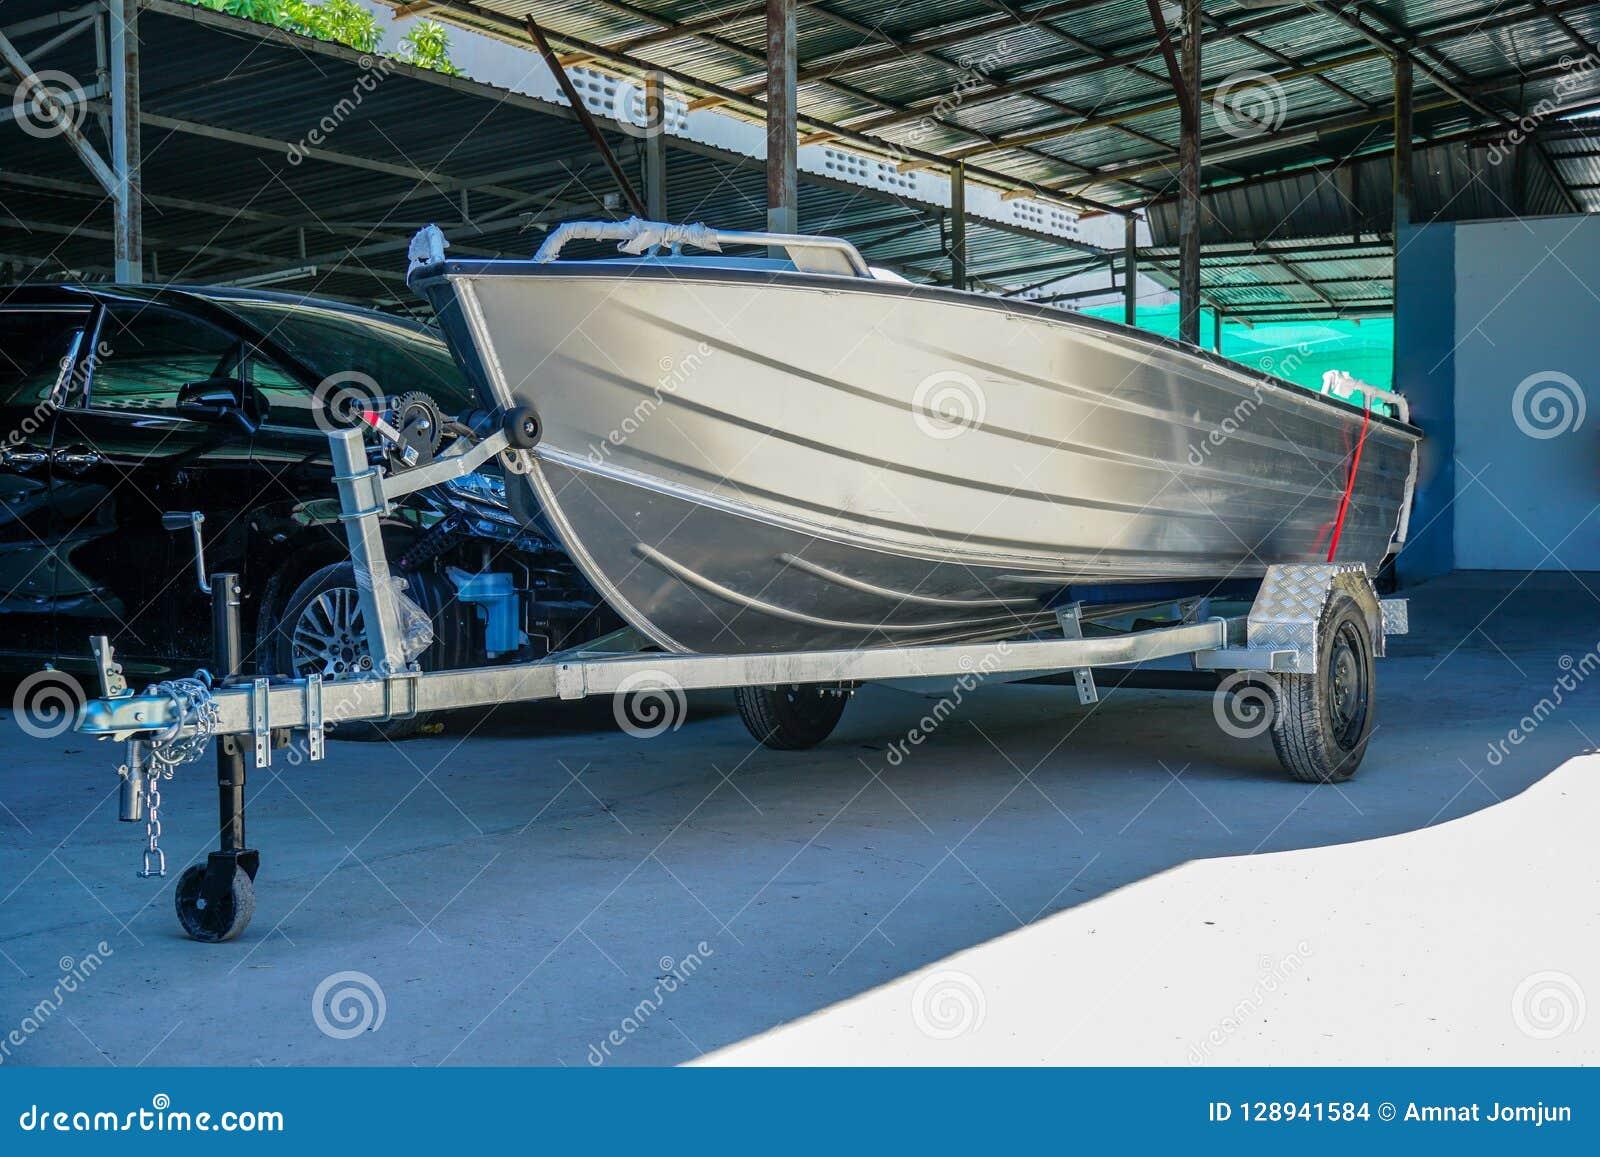 Aluminum Boat 14 Feet Wait For Paint Stock Photo Image Of